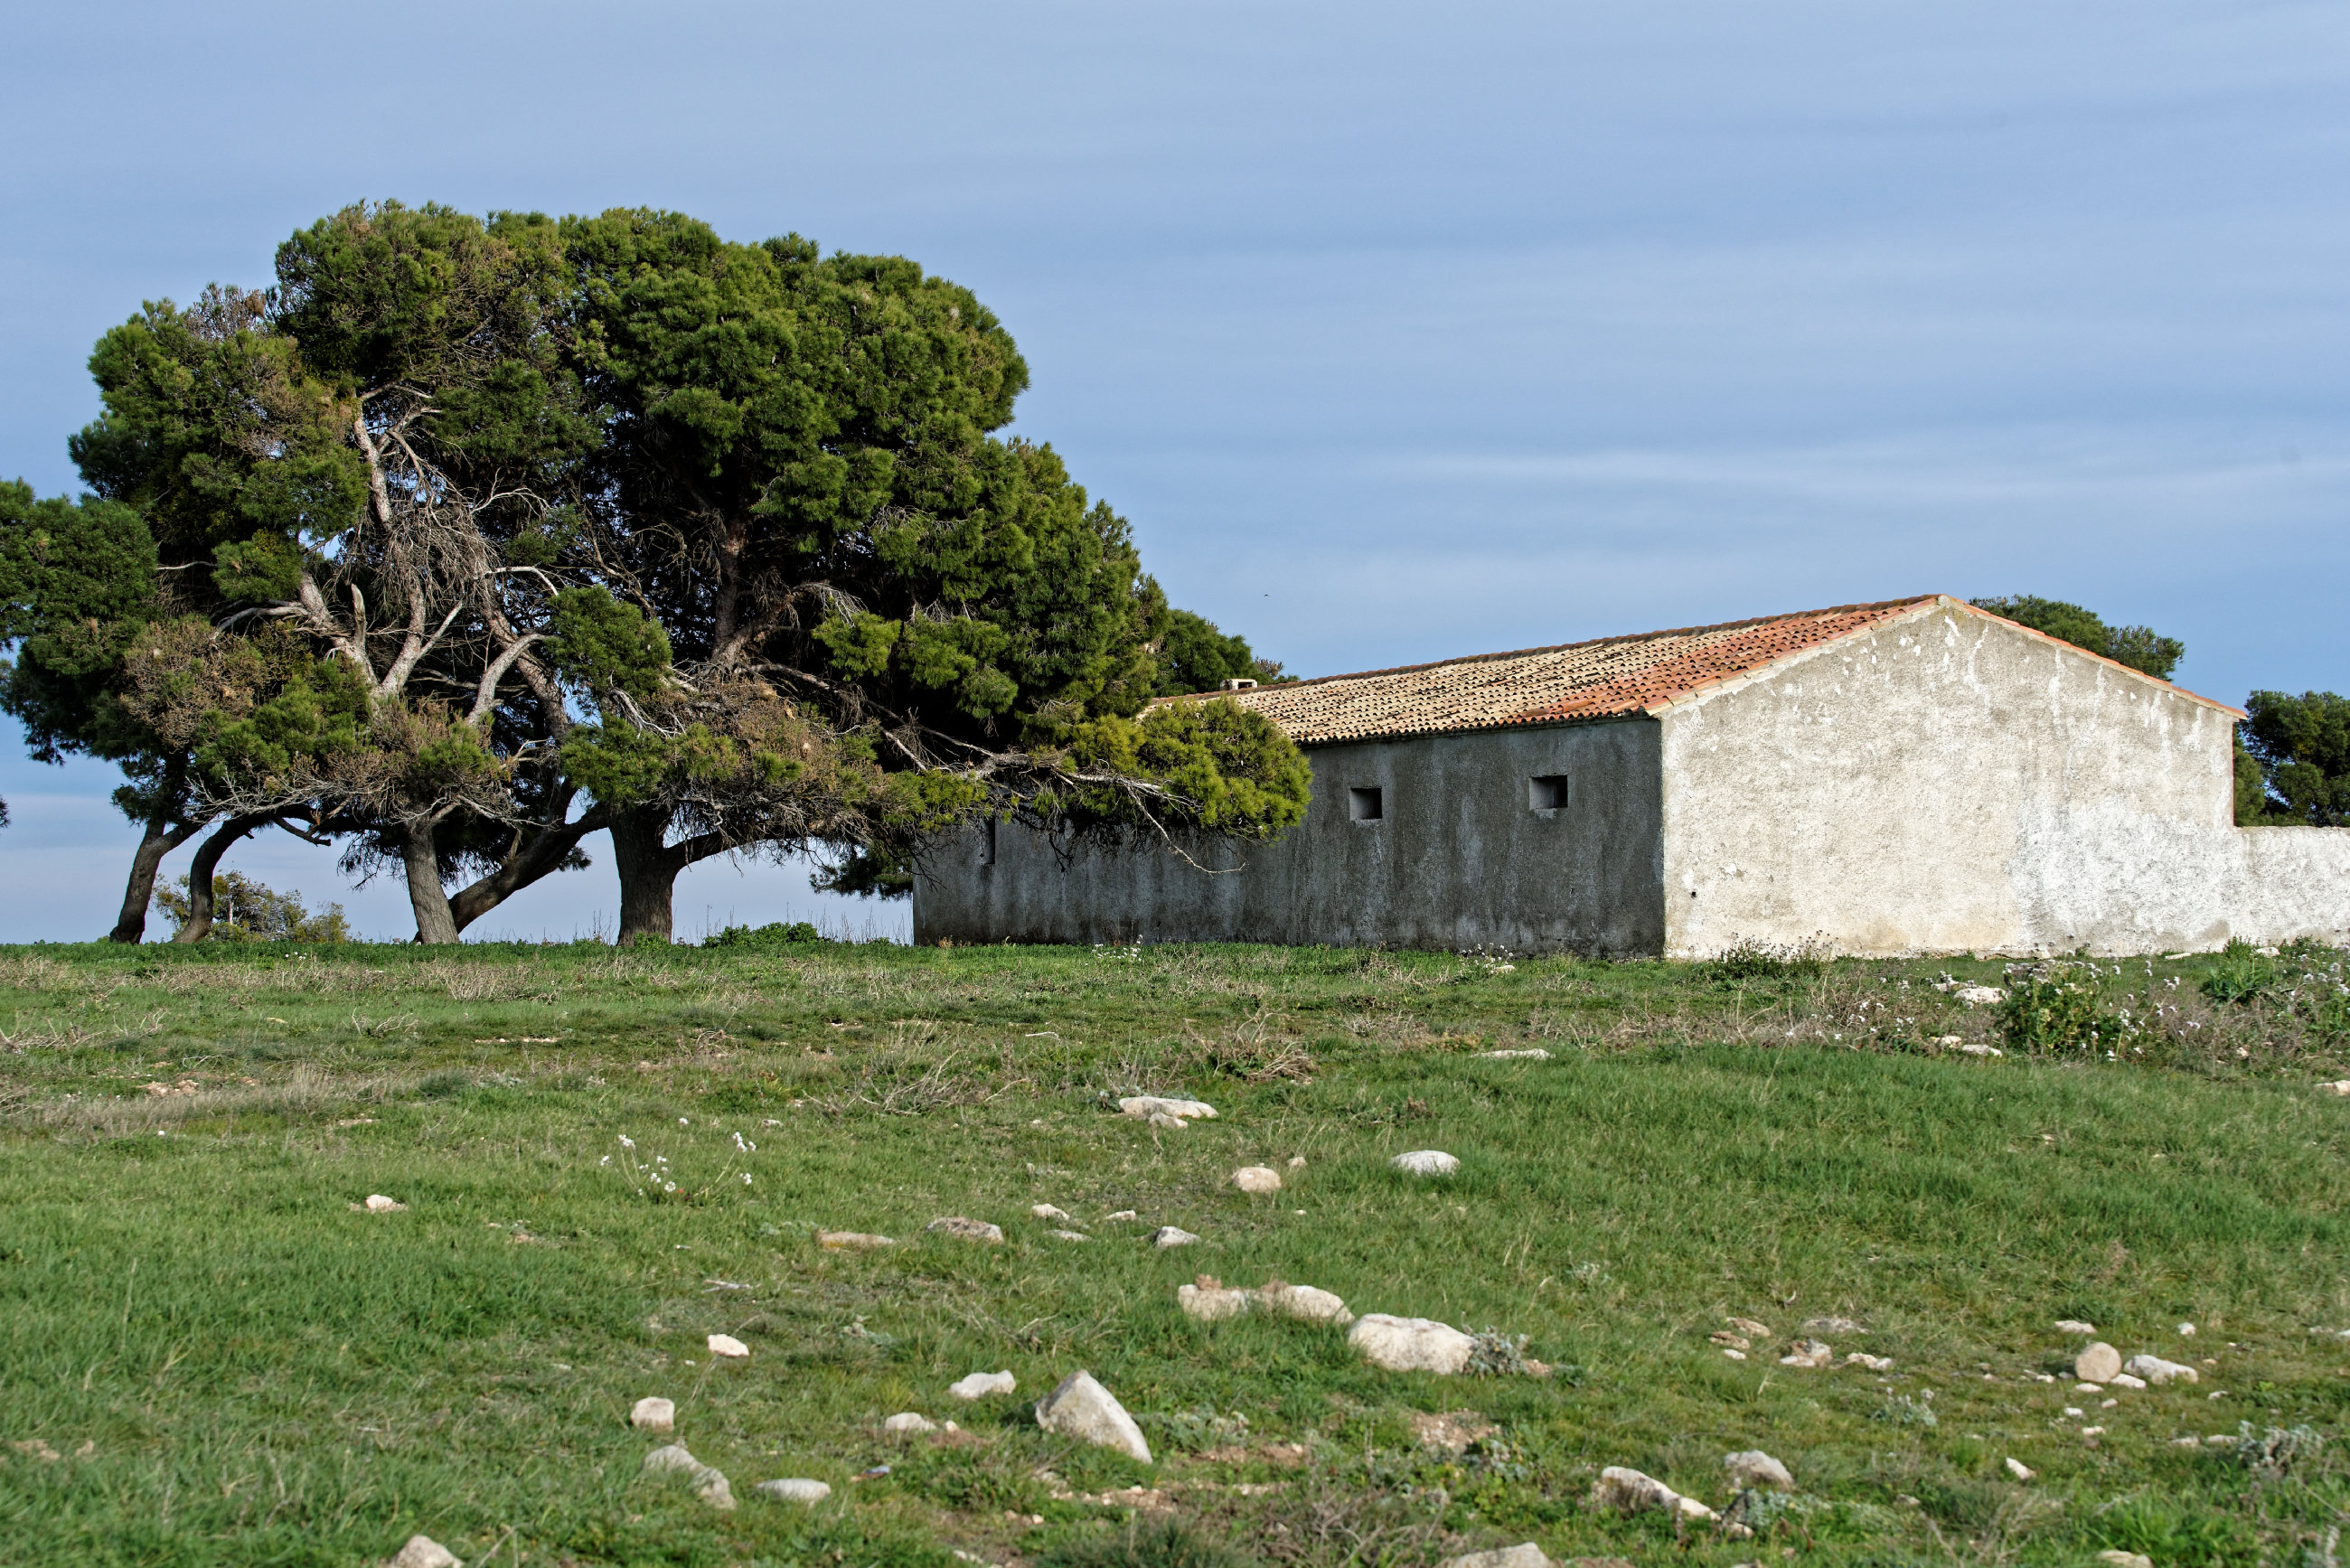 150309-Piste Sanctuaire Sanco Abarca-NA125 (Bardenas La negra) (50)